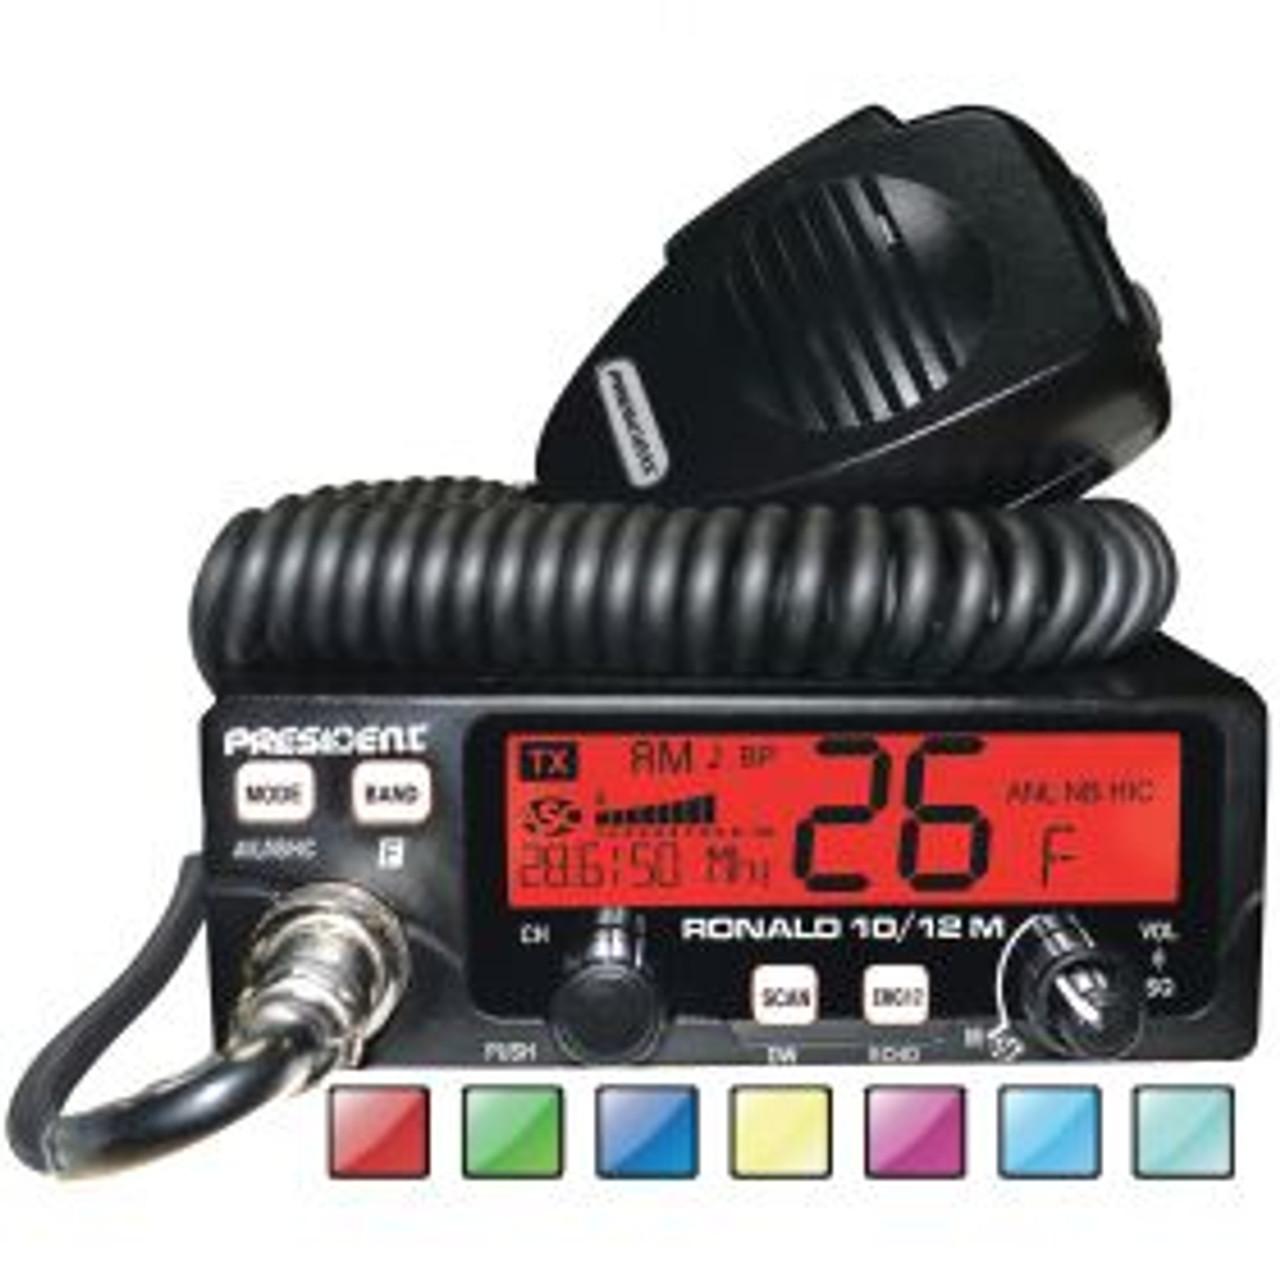 PRESIDENT - RONALD 50 WATTS 10/12 METER AM/FM AMATEUR RADIO